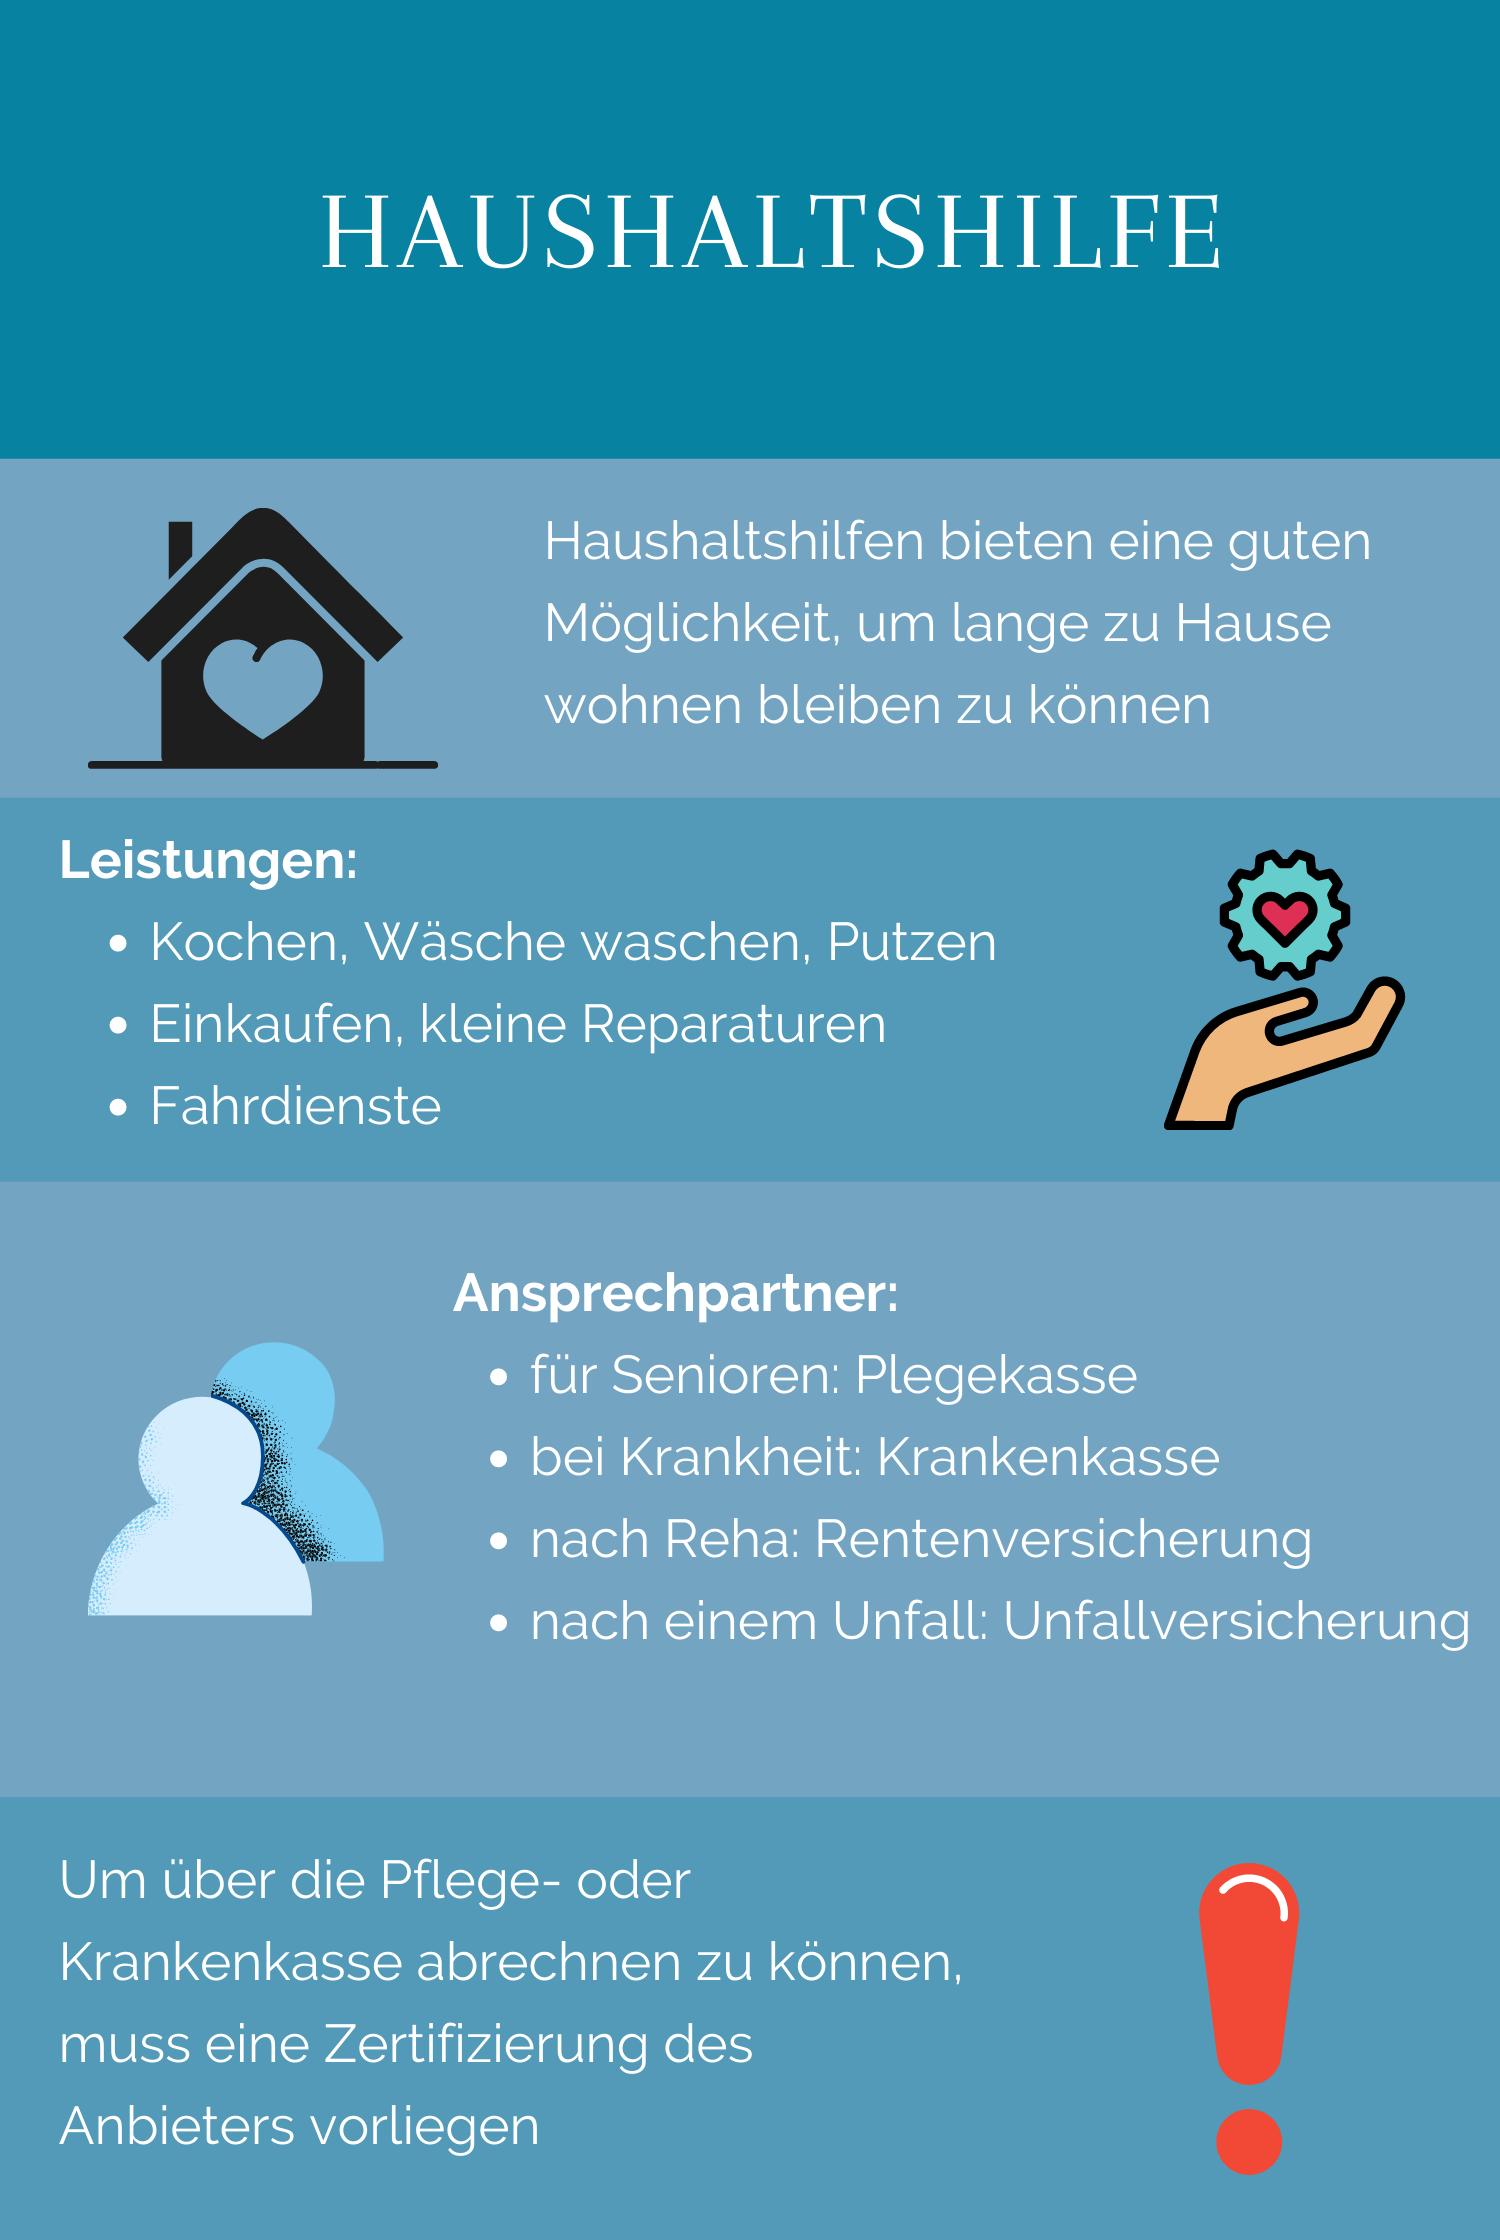 Infografik Haushaltshilfe